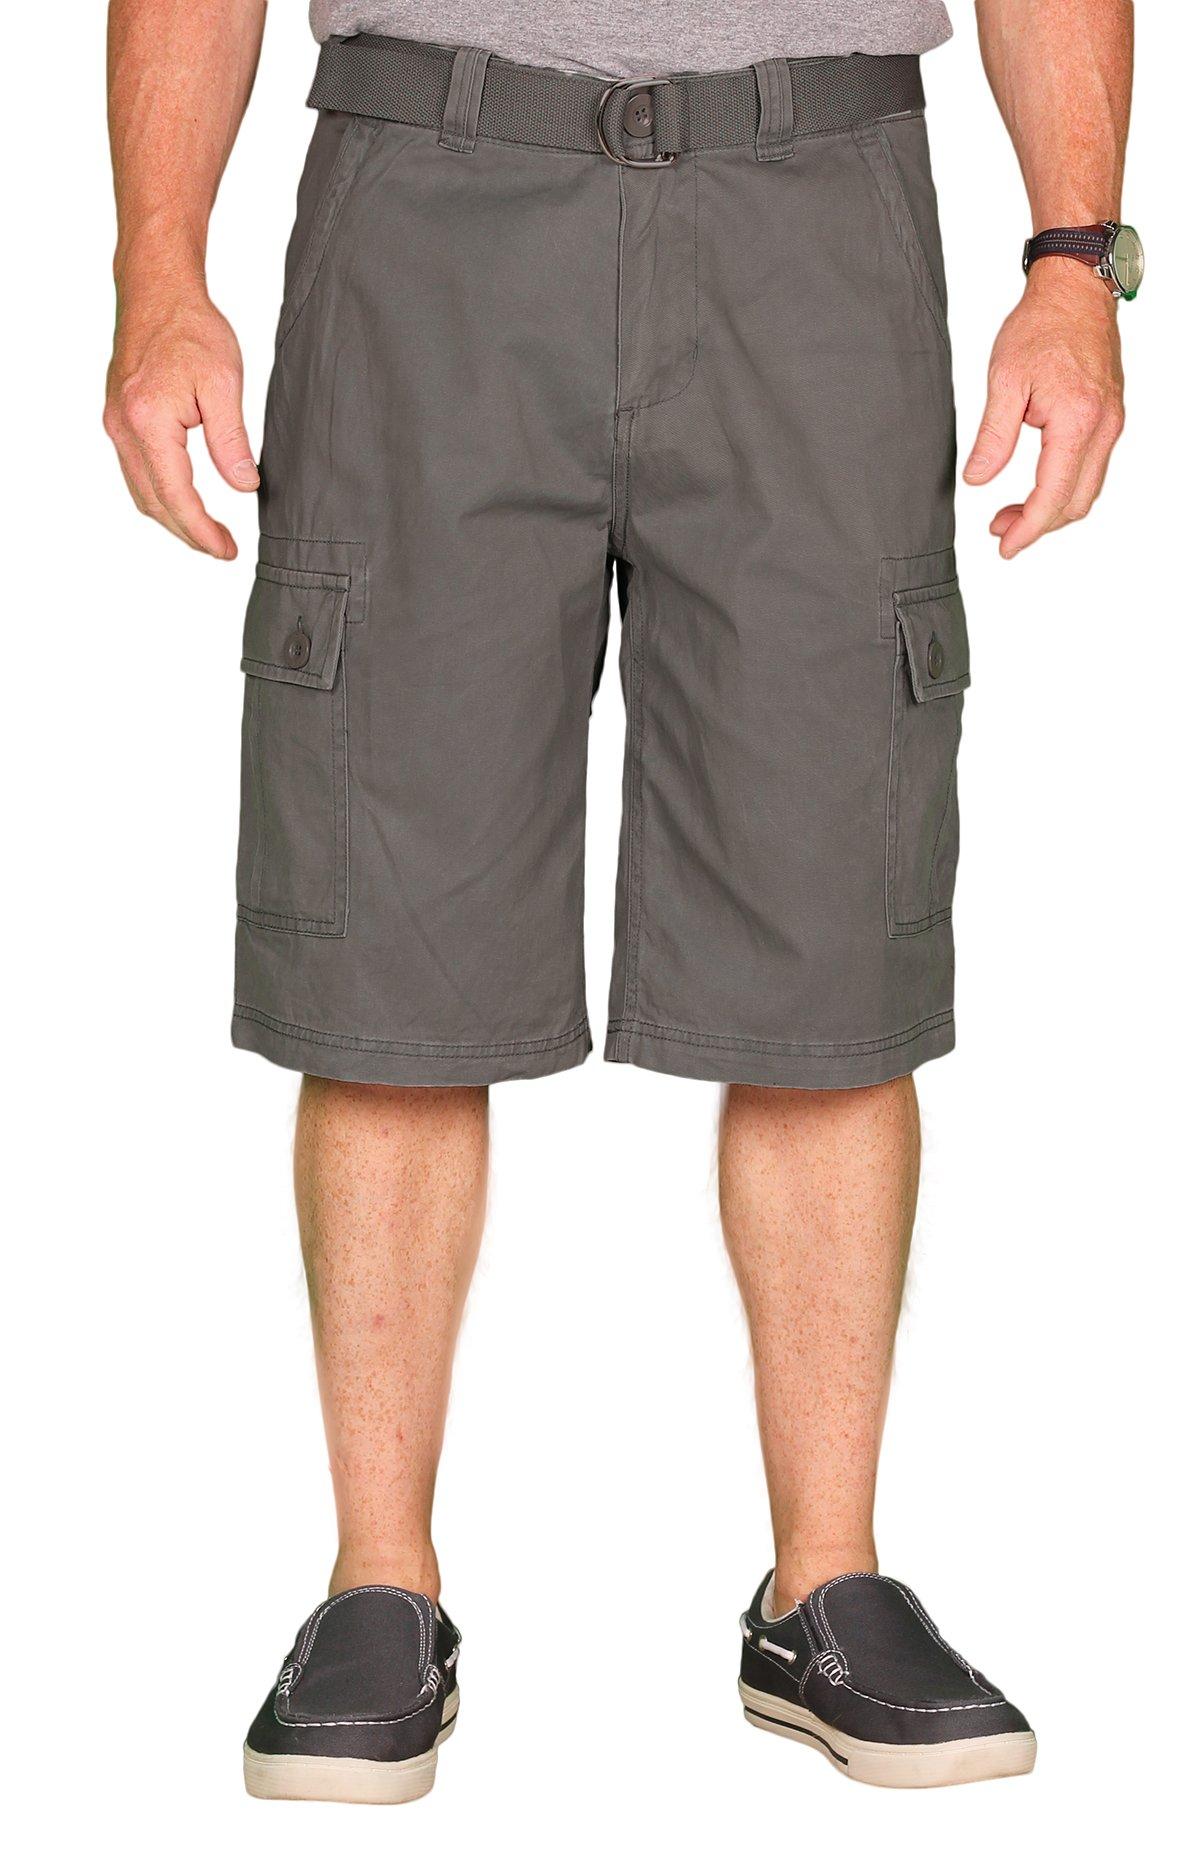 One Tough Brand OTB Men's Cotton Cargo/Camp Short, Light Grey, Size 34